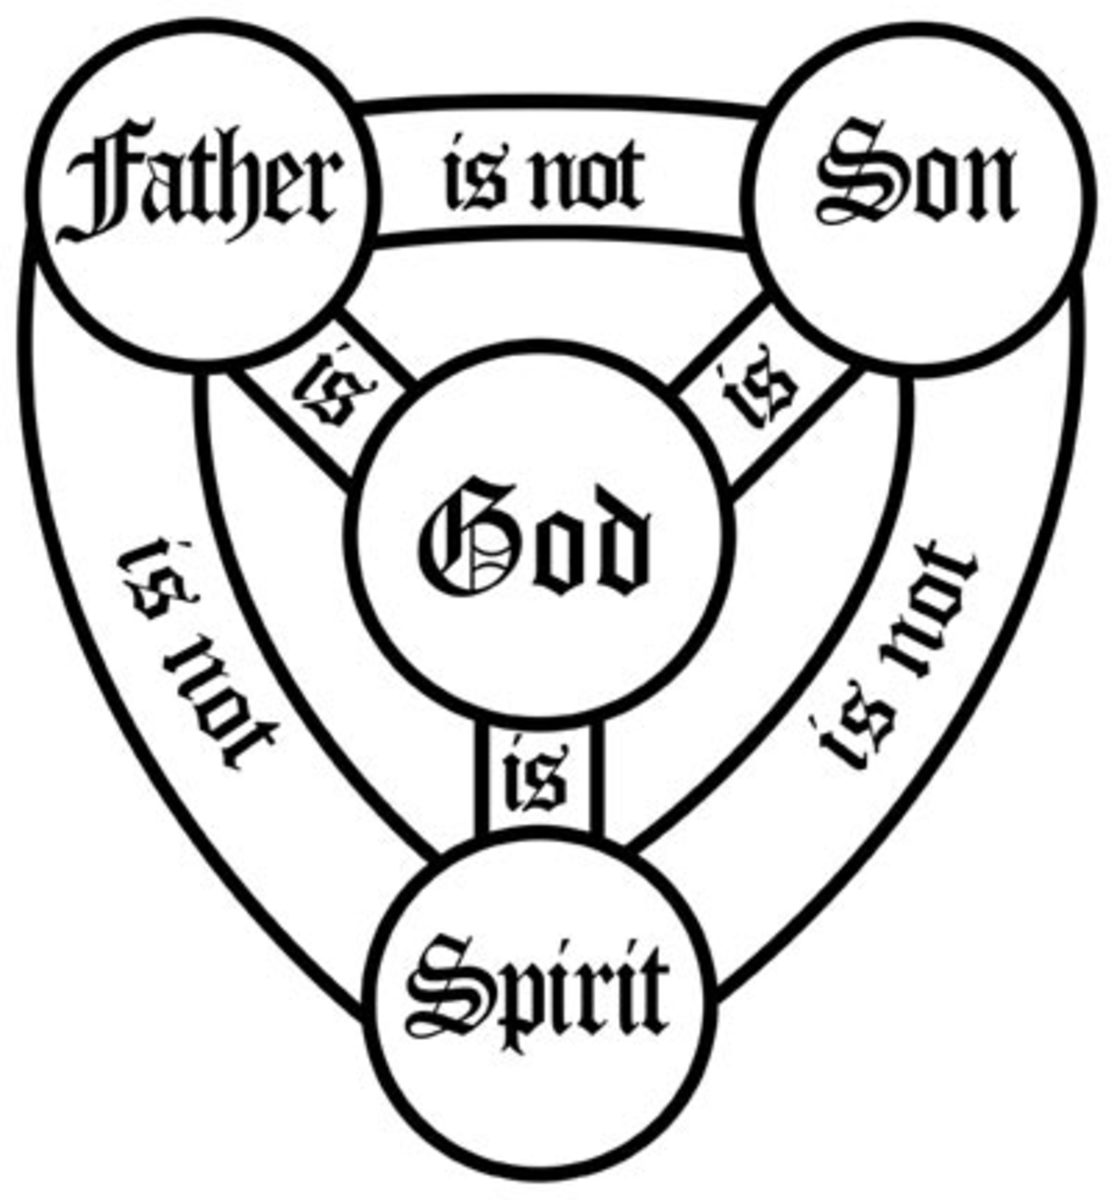 regular-normal-christianity-the-trinity